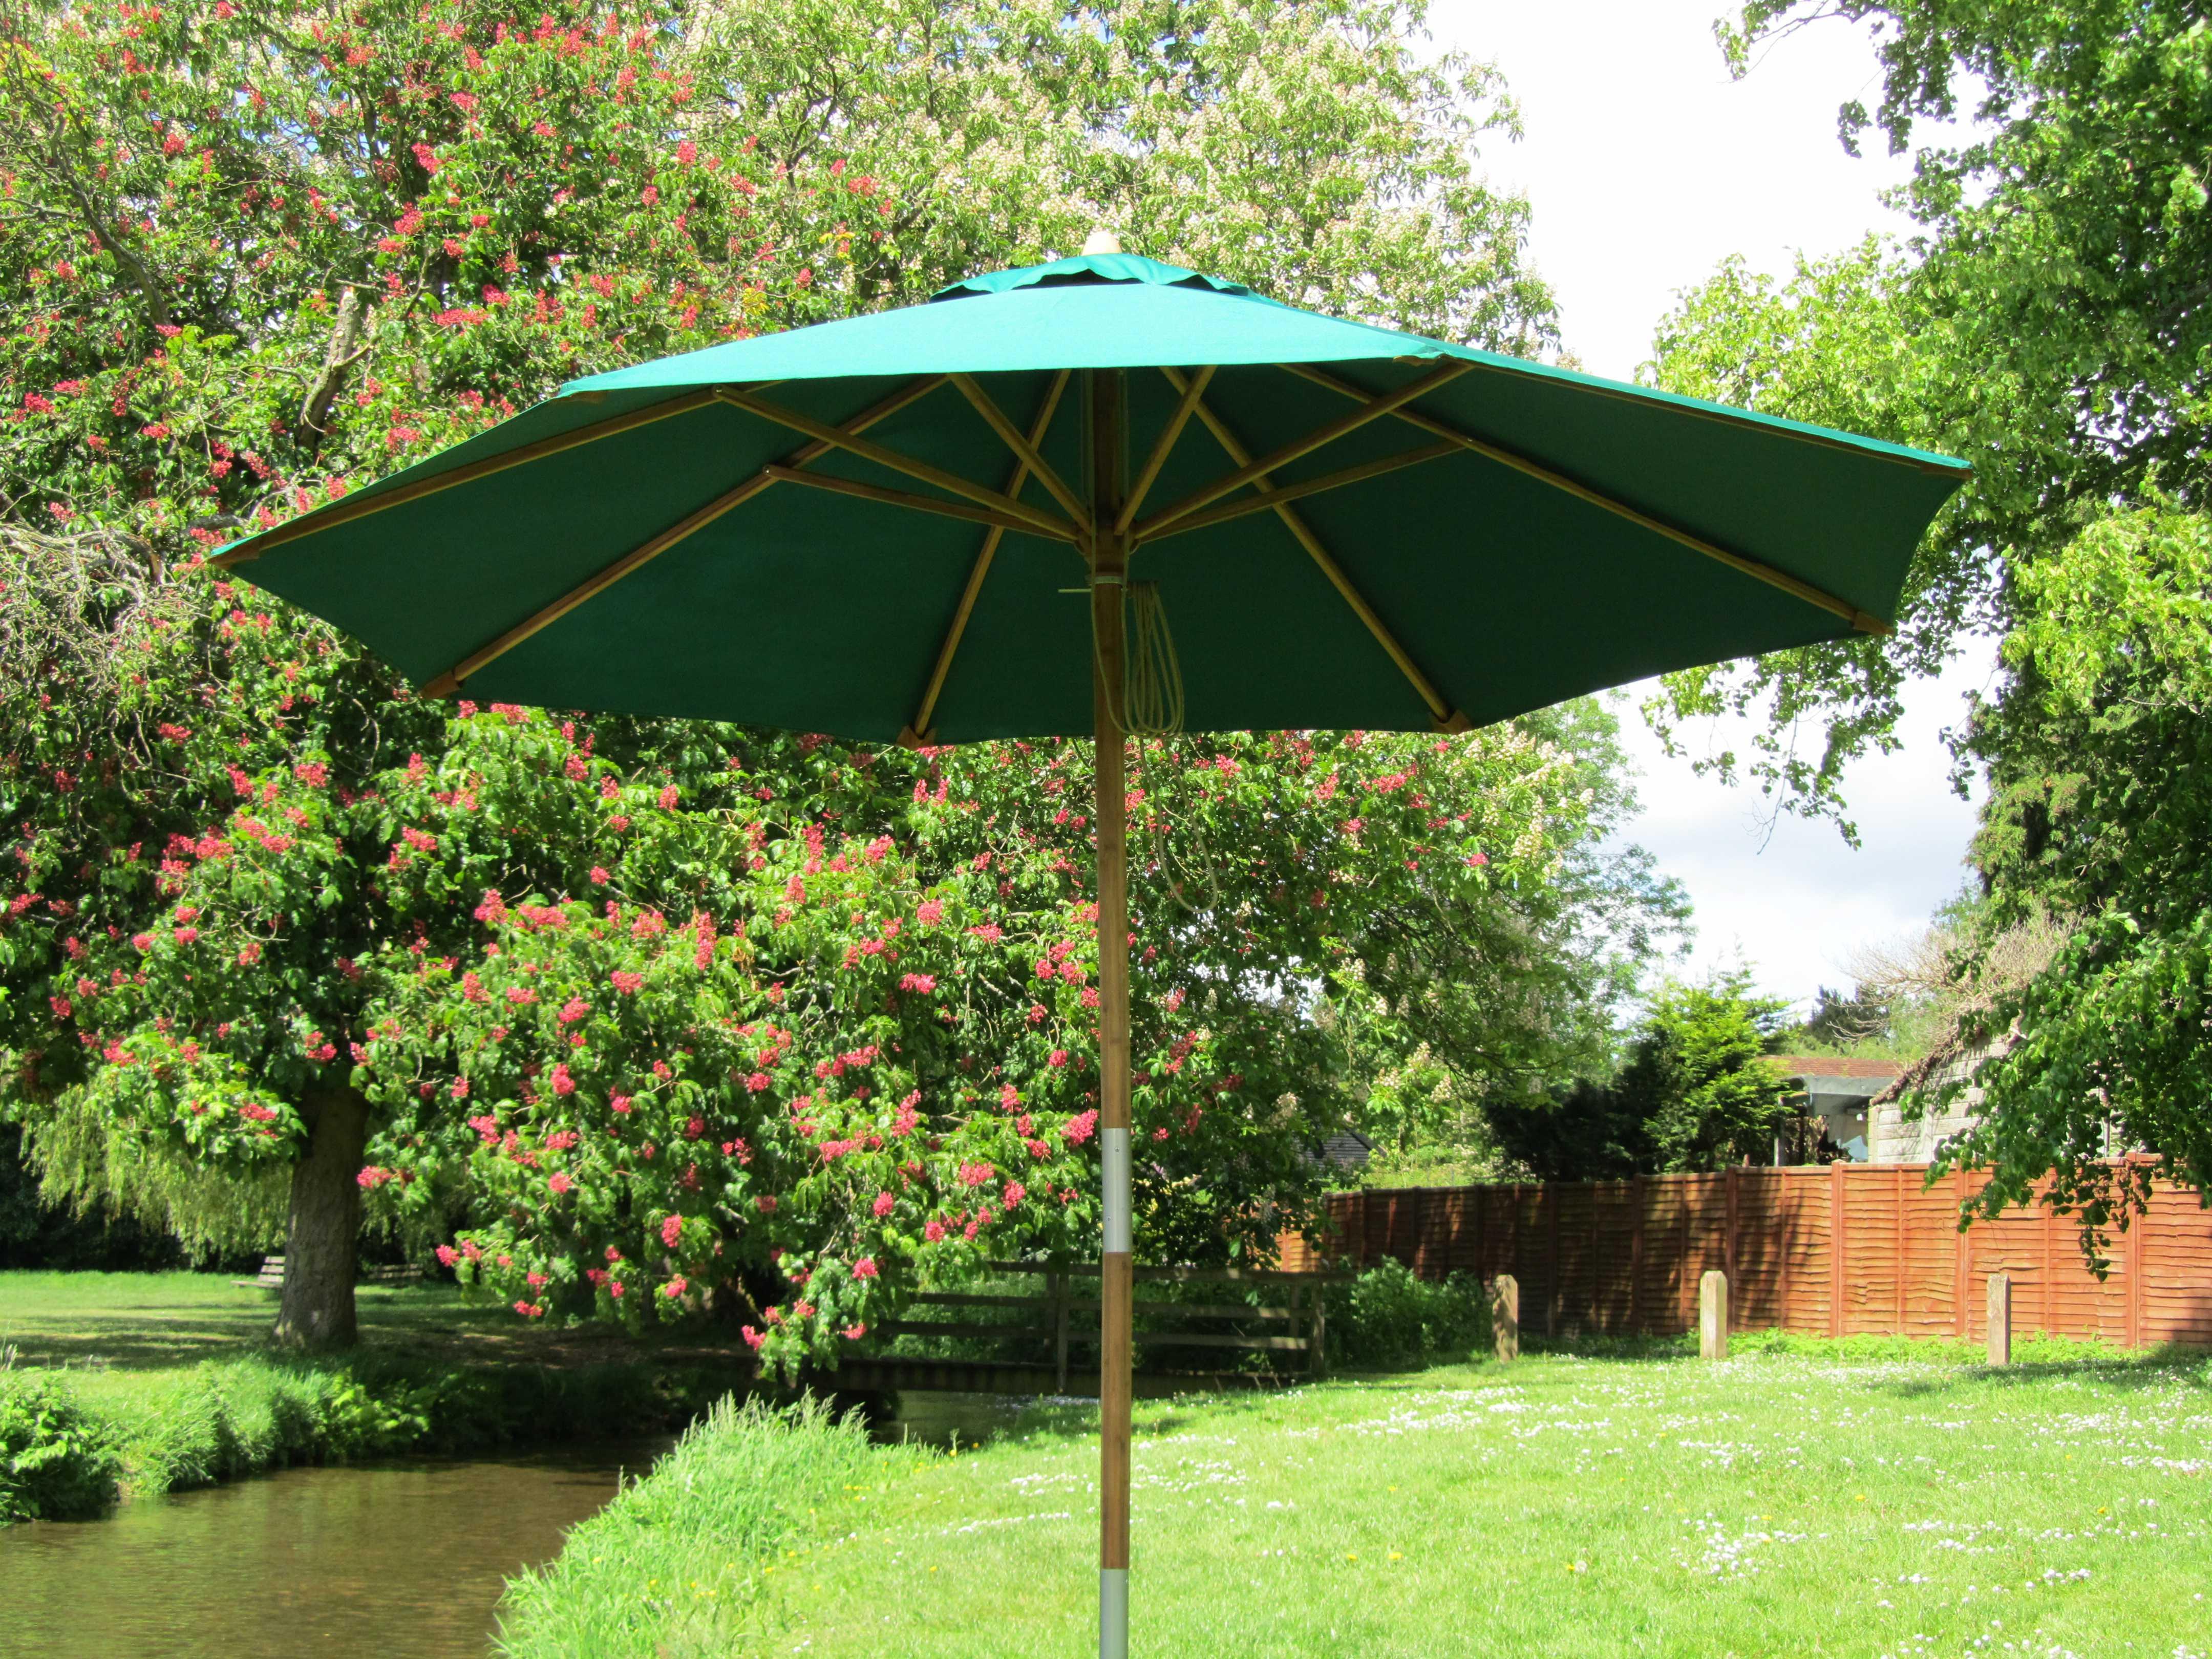 Bambrella Sirocco Wood 10 Round Pulley Lift Umbrella 3